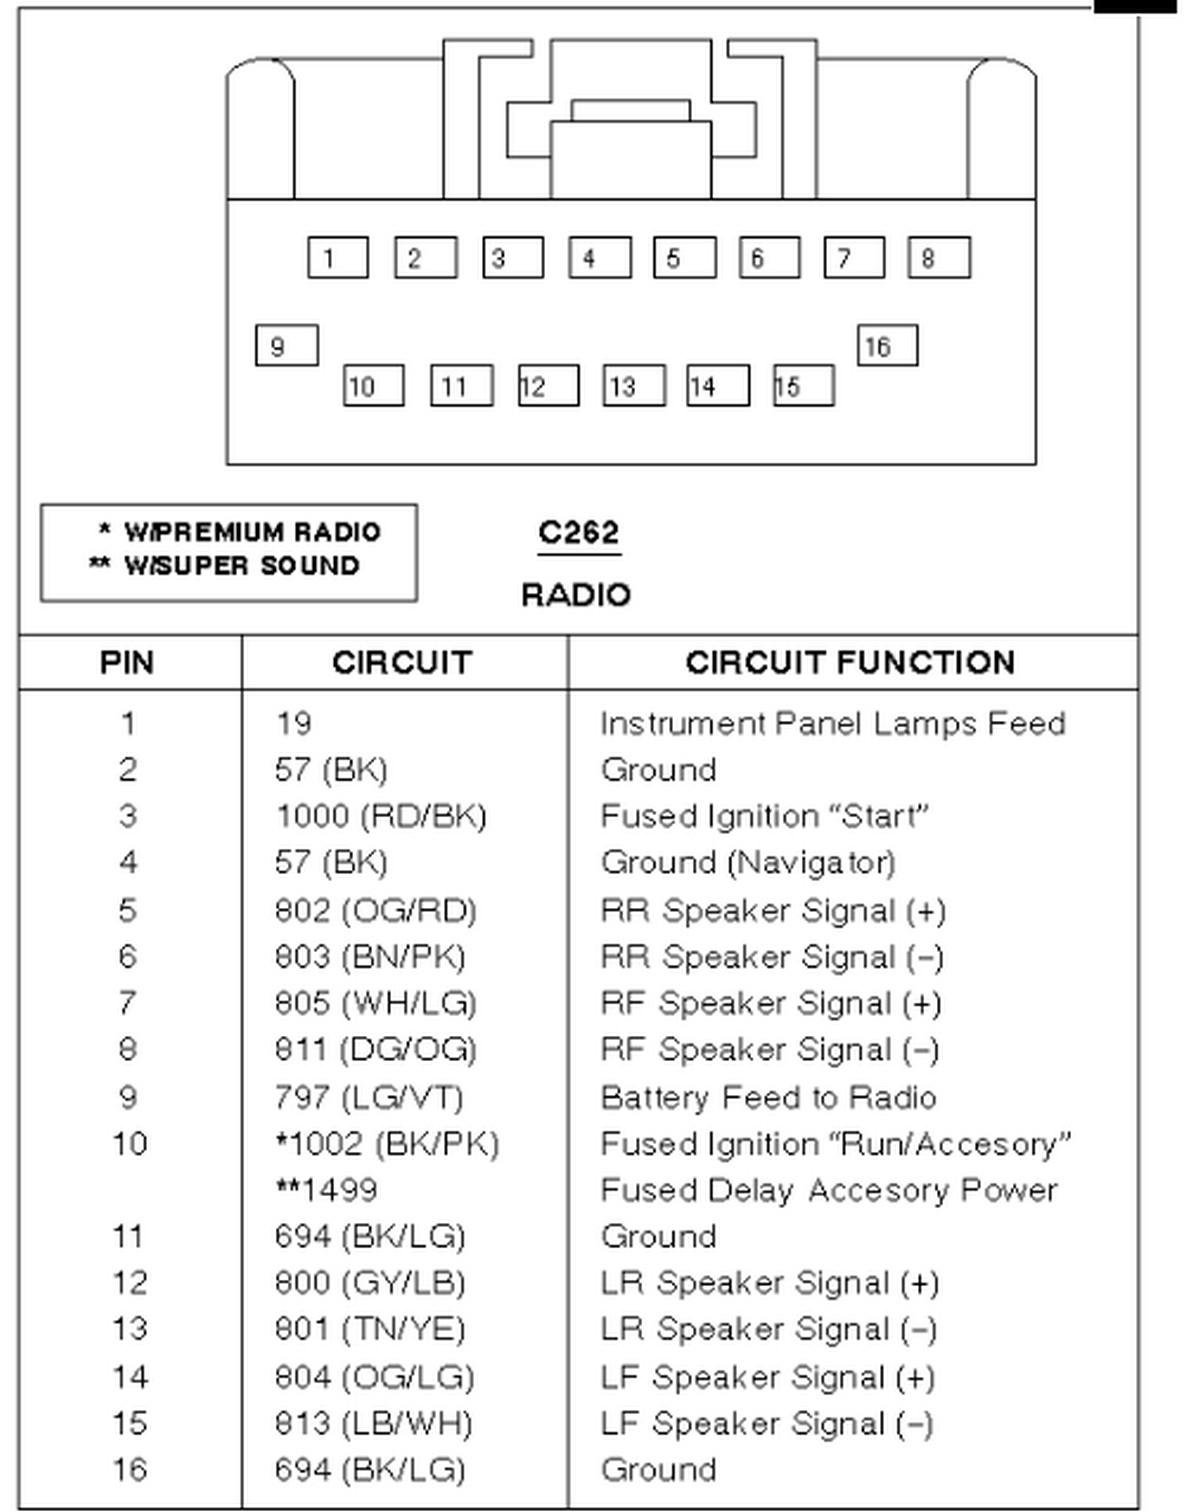 2011 ford fiesta radio wiring diagram | wiring diagram |  conductor-saturnus.latinacoupon.it  wiring diagram